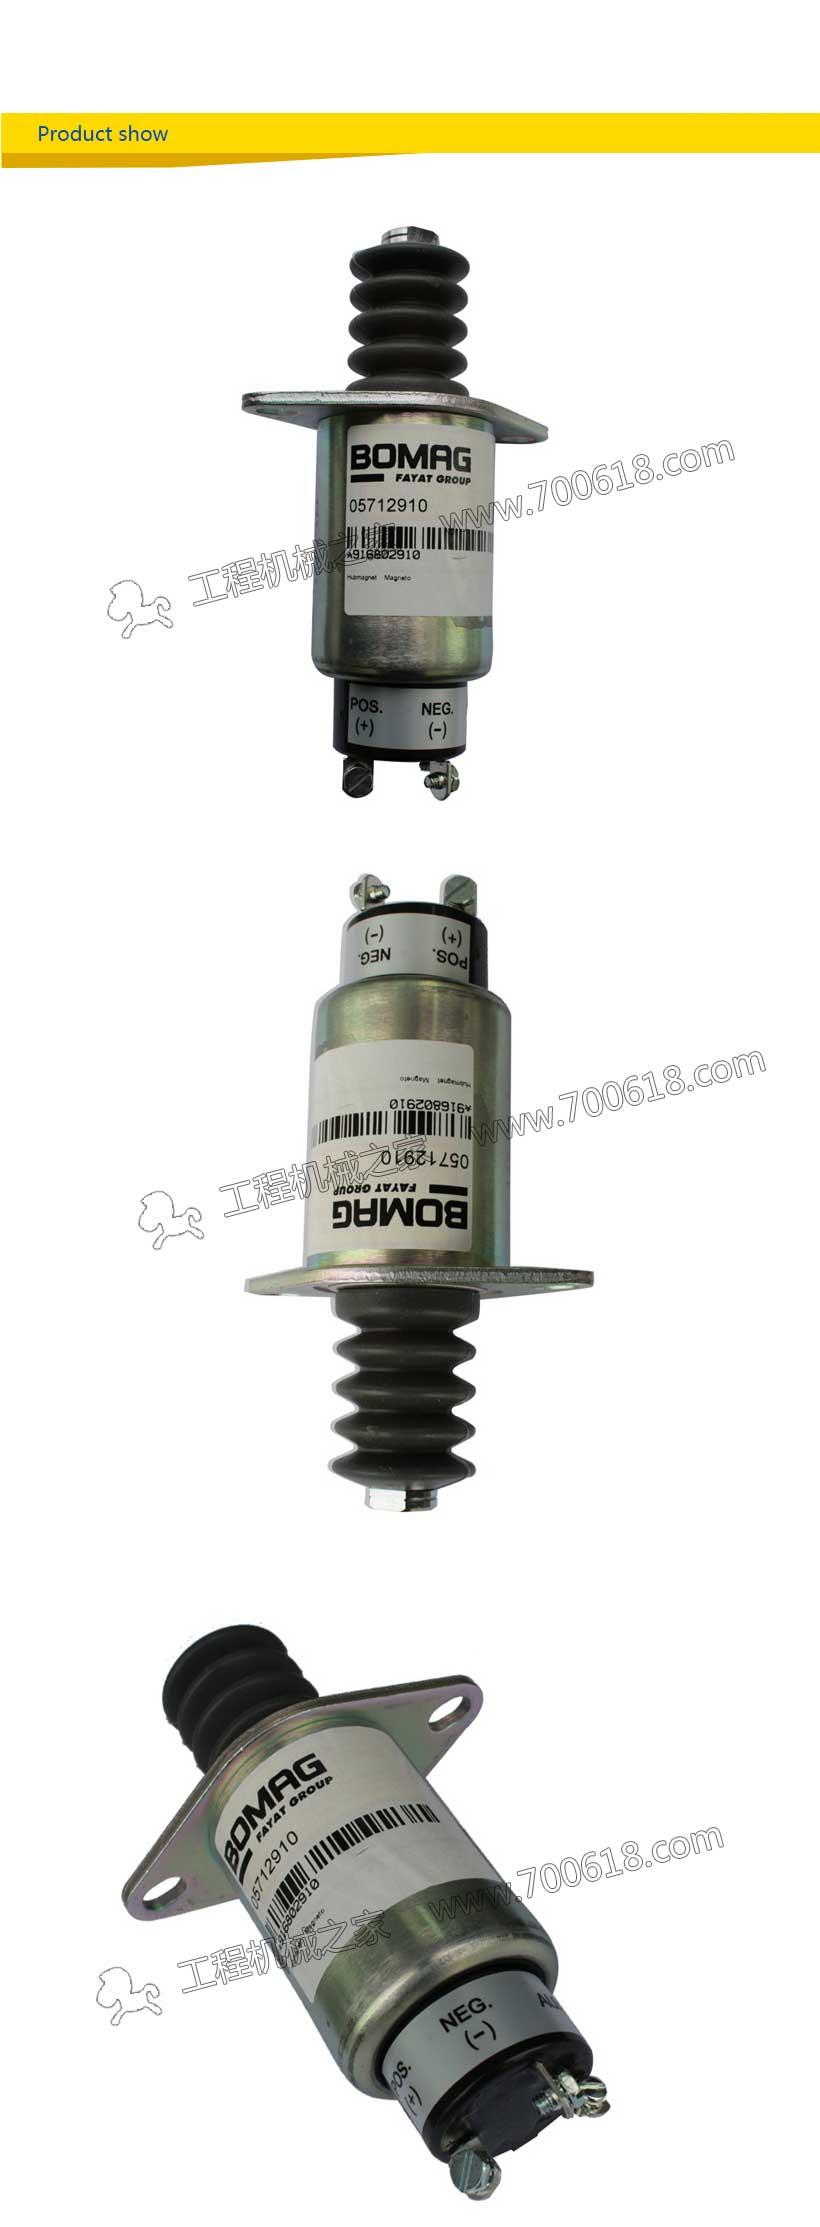 BOMAG 203 Double steel wheel Throttle solenoid valve